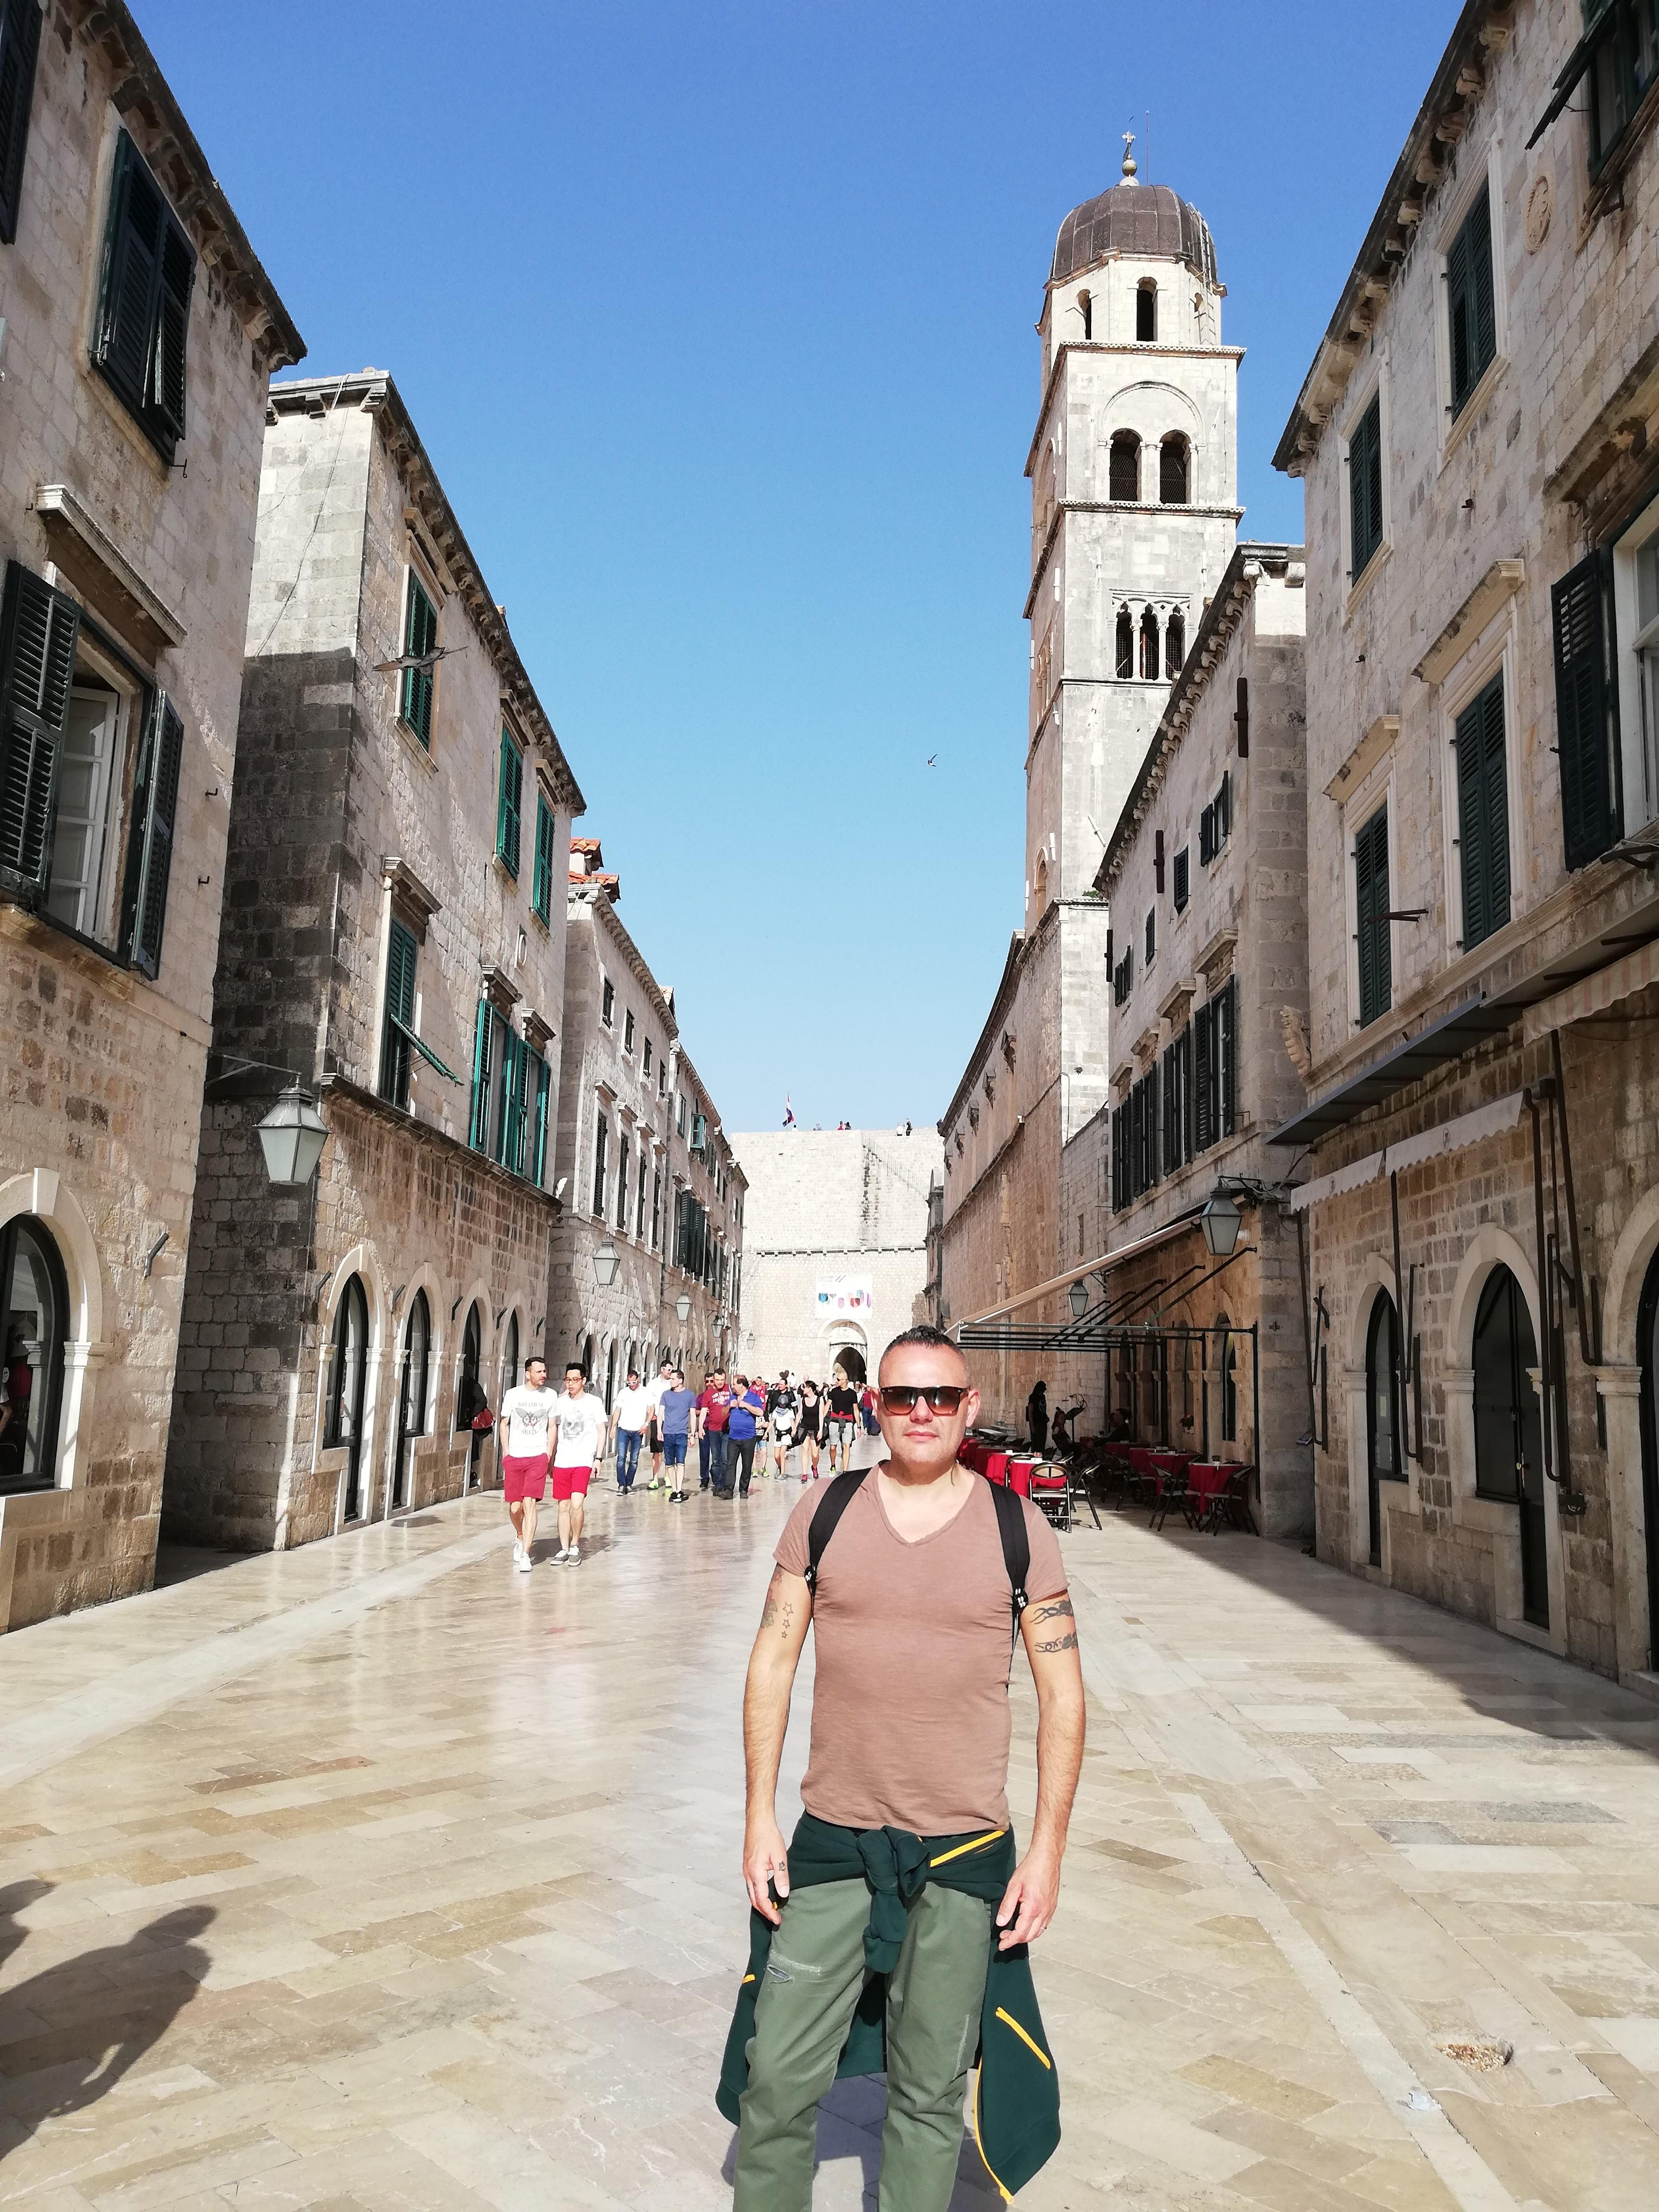 Lo Stradun, Dubrovnik